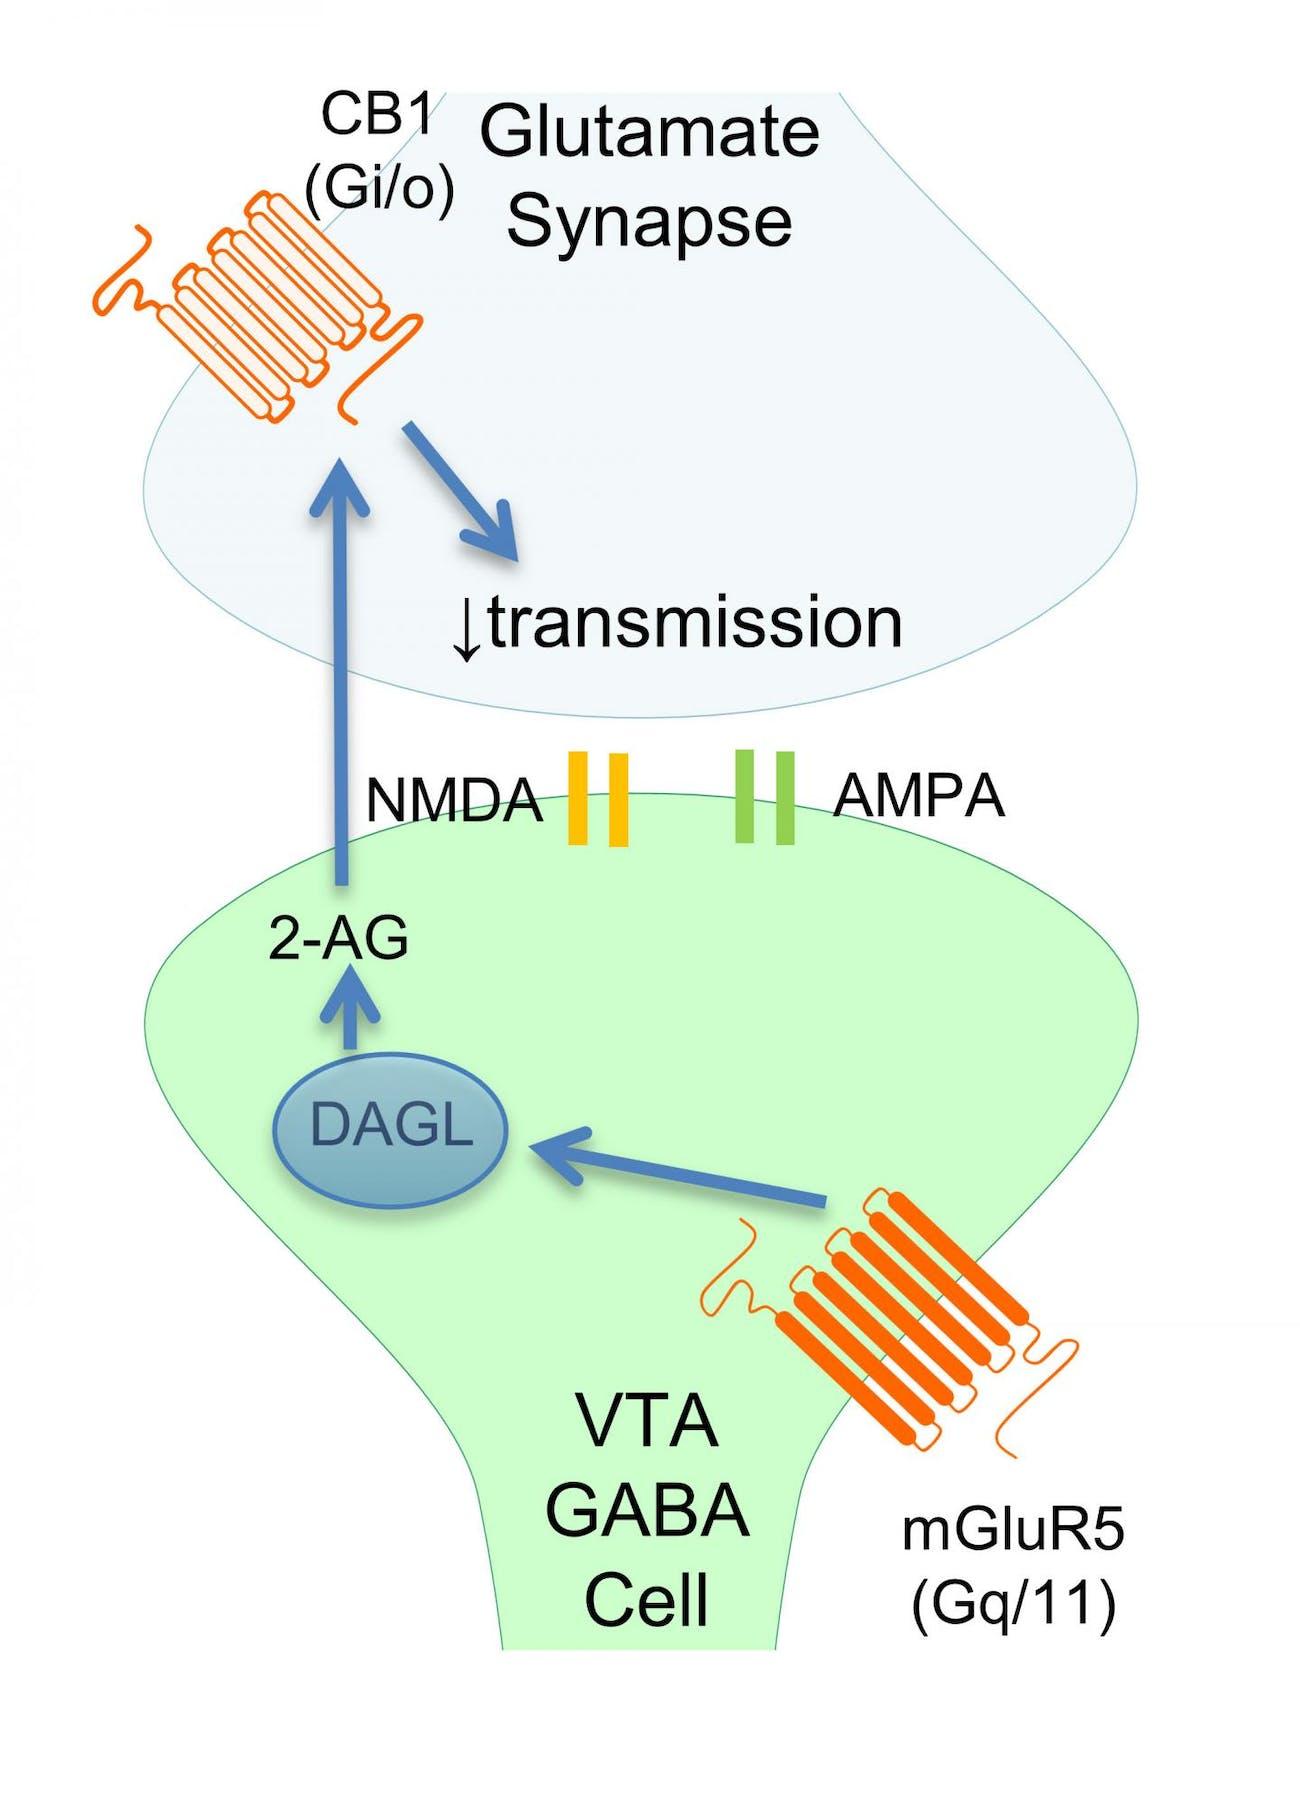 Adhd Drugs Increase Brain Glutamate >> Long Term Marijuana Use Changes Brain At The Cellular Level Say